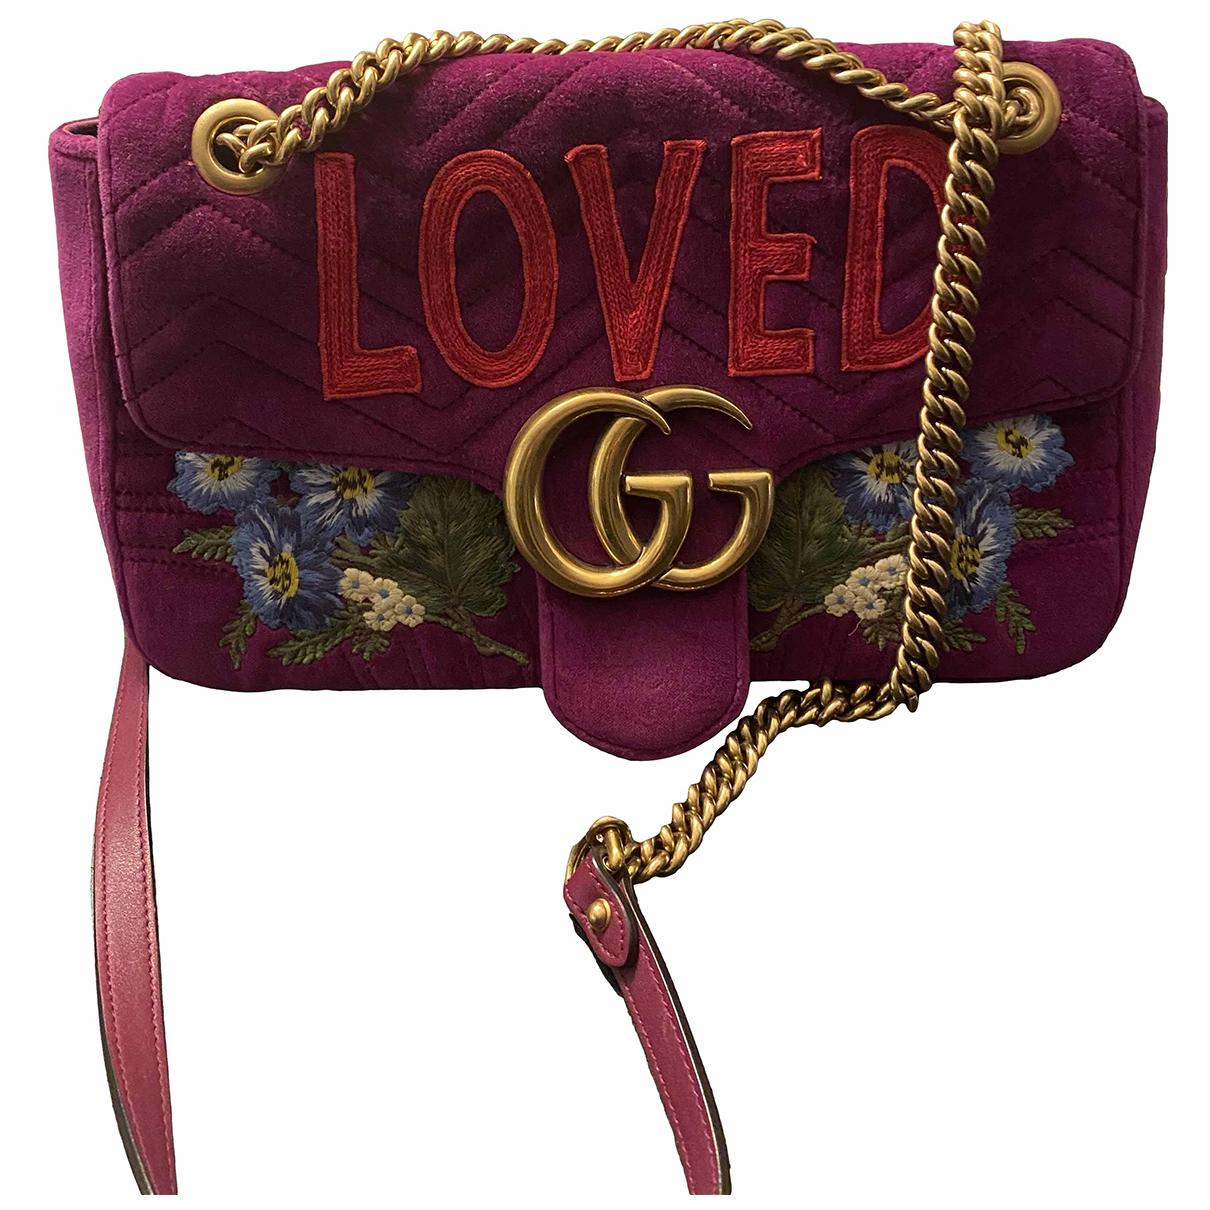 Gucci Marmont Handtasche in  Lila Samt